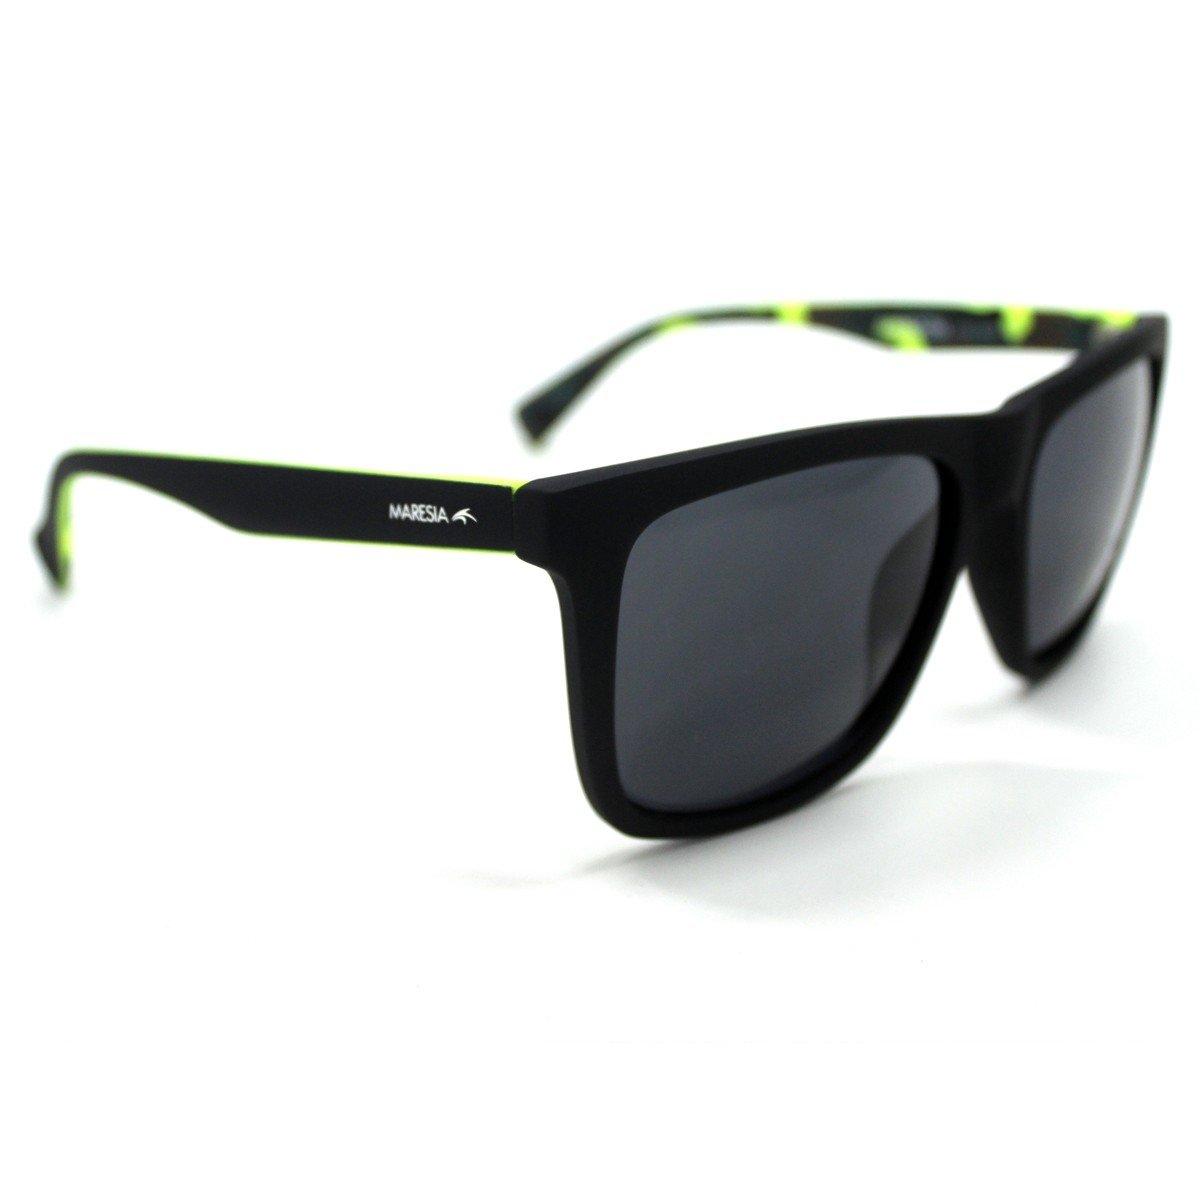 36e3930b11f64 Óculos De Sol Maresia Óculos Masculino Camocim - Compre Agora   Netshoes